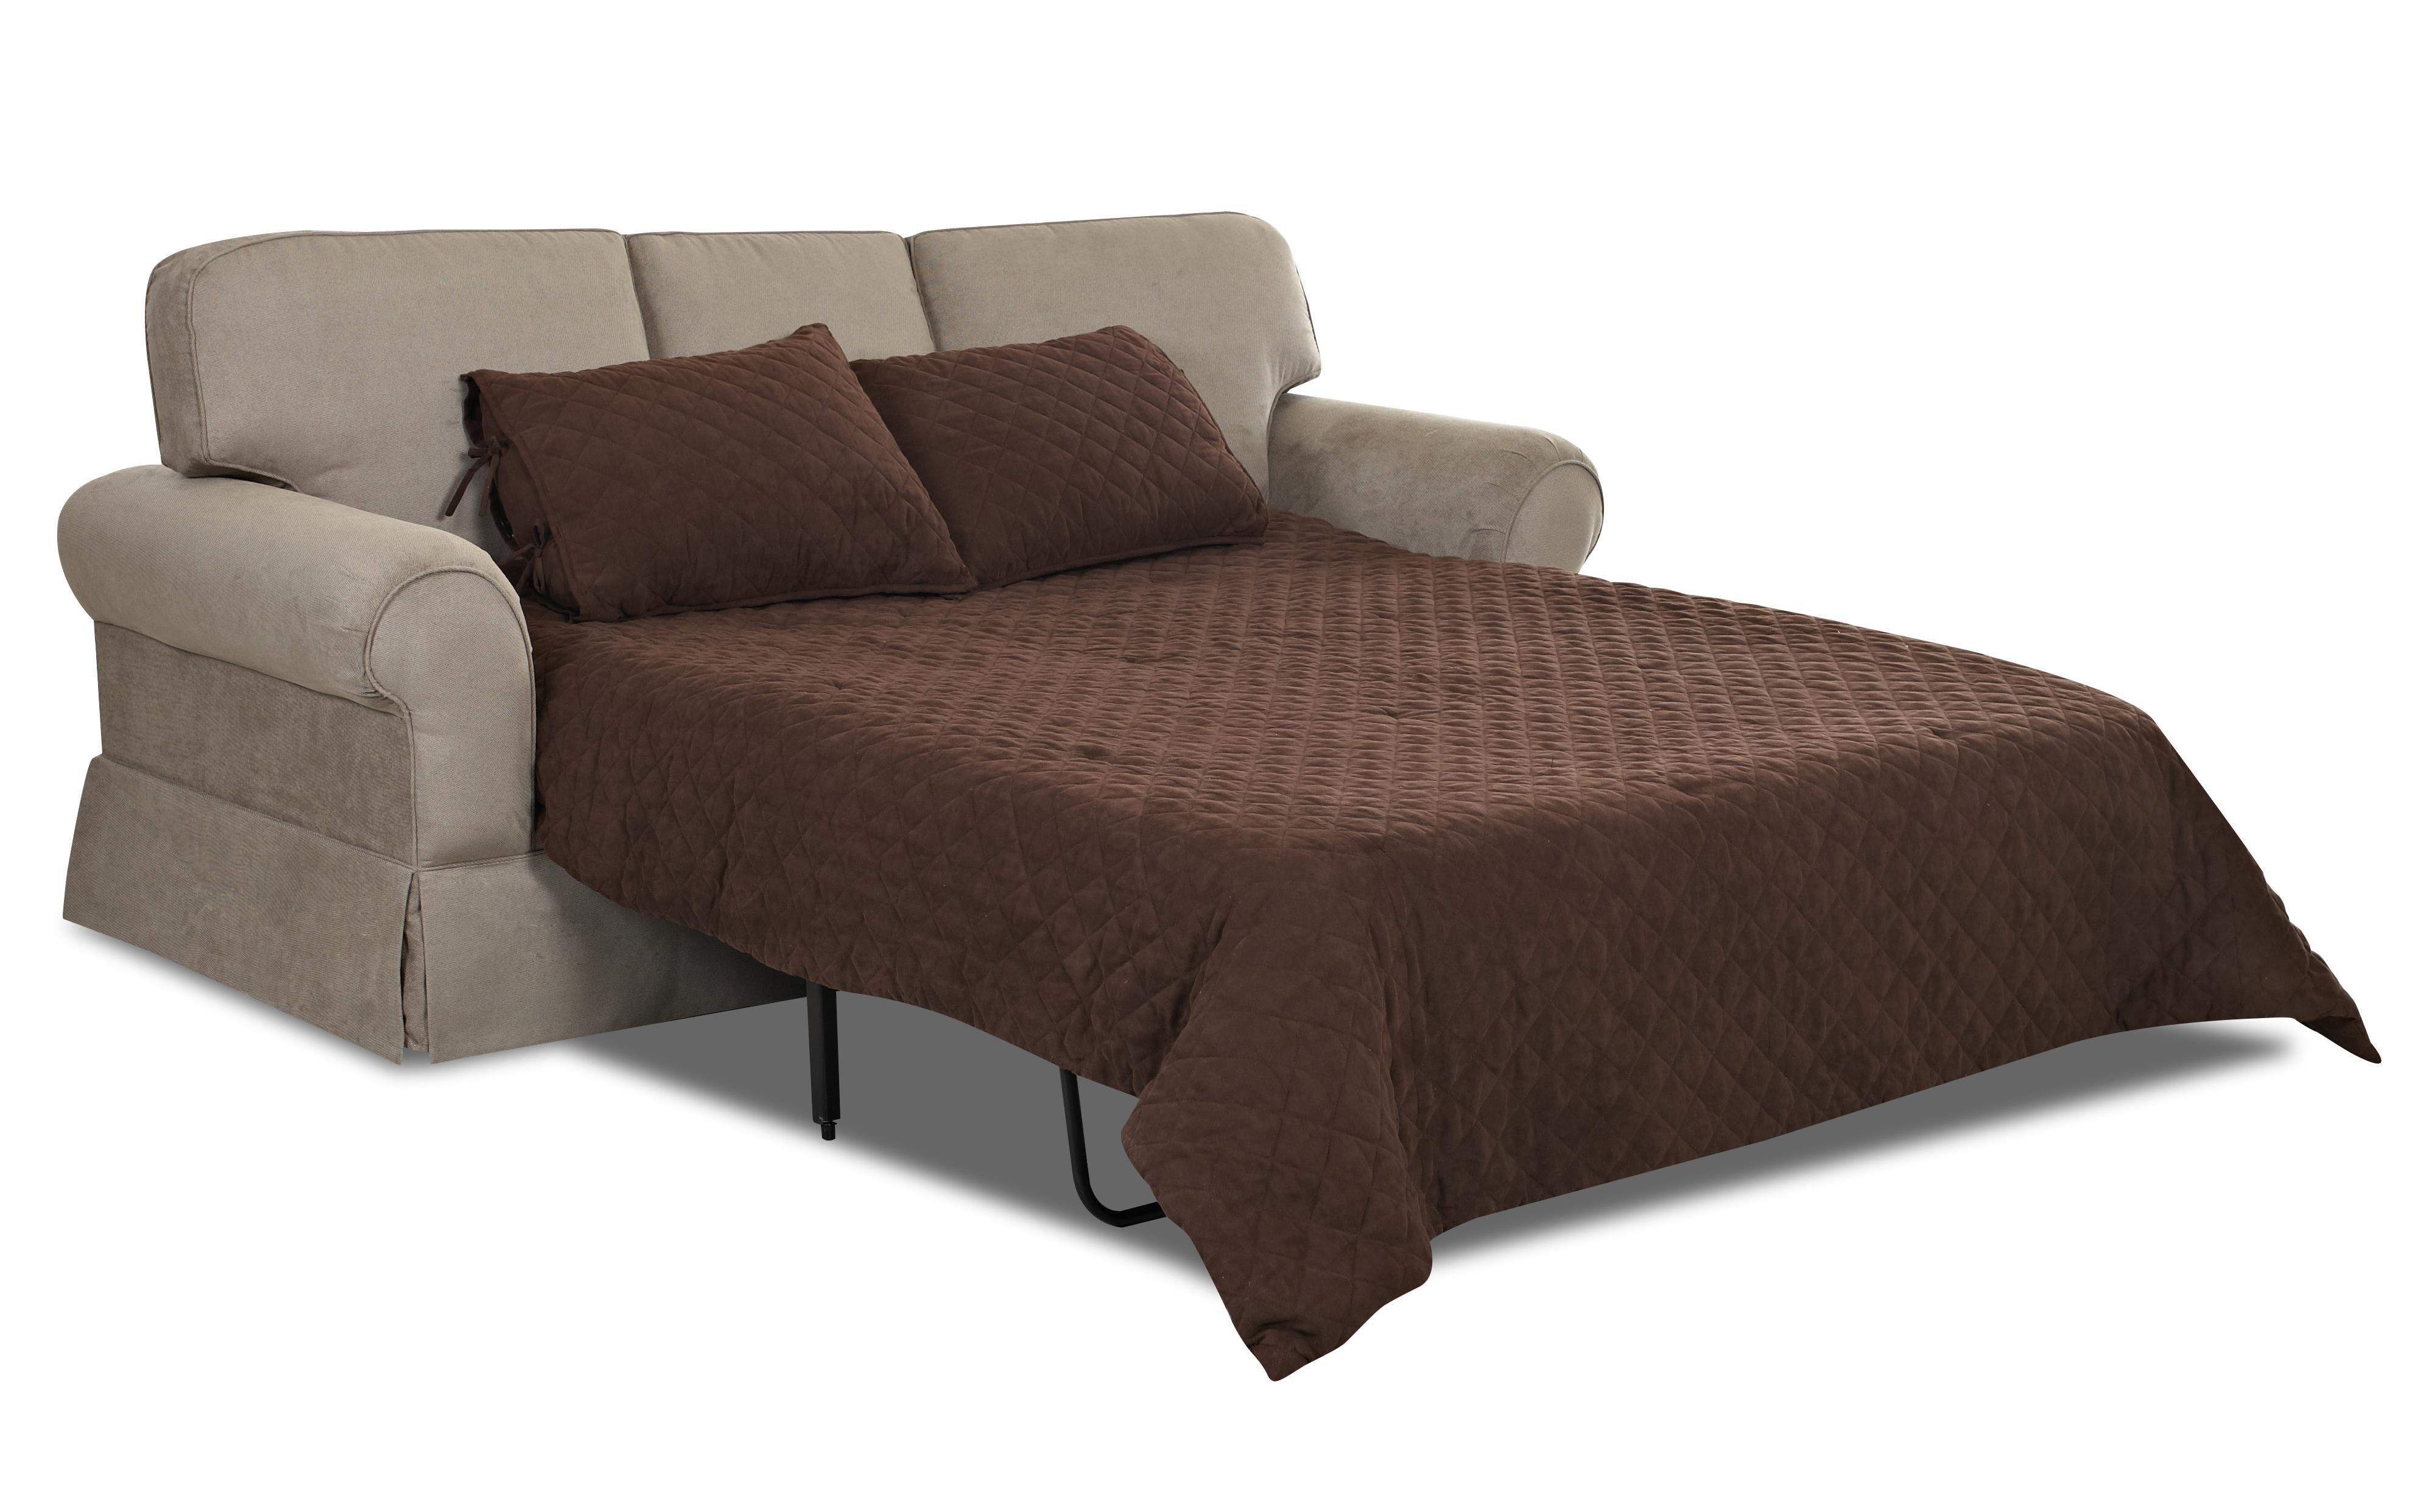 Woodwin Dreamquest Queen Sleeper Sofa By Simple Elegance At Gardiners Furniture Furniture Sleeper Sofa Furniture Mall